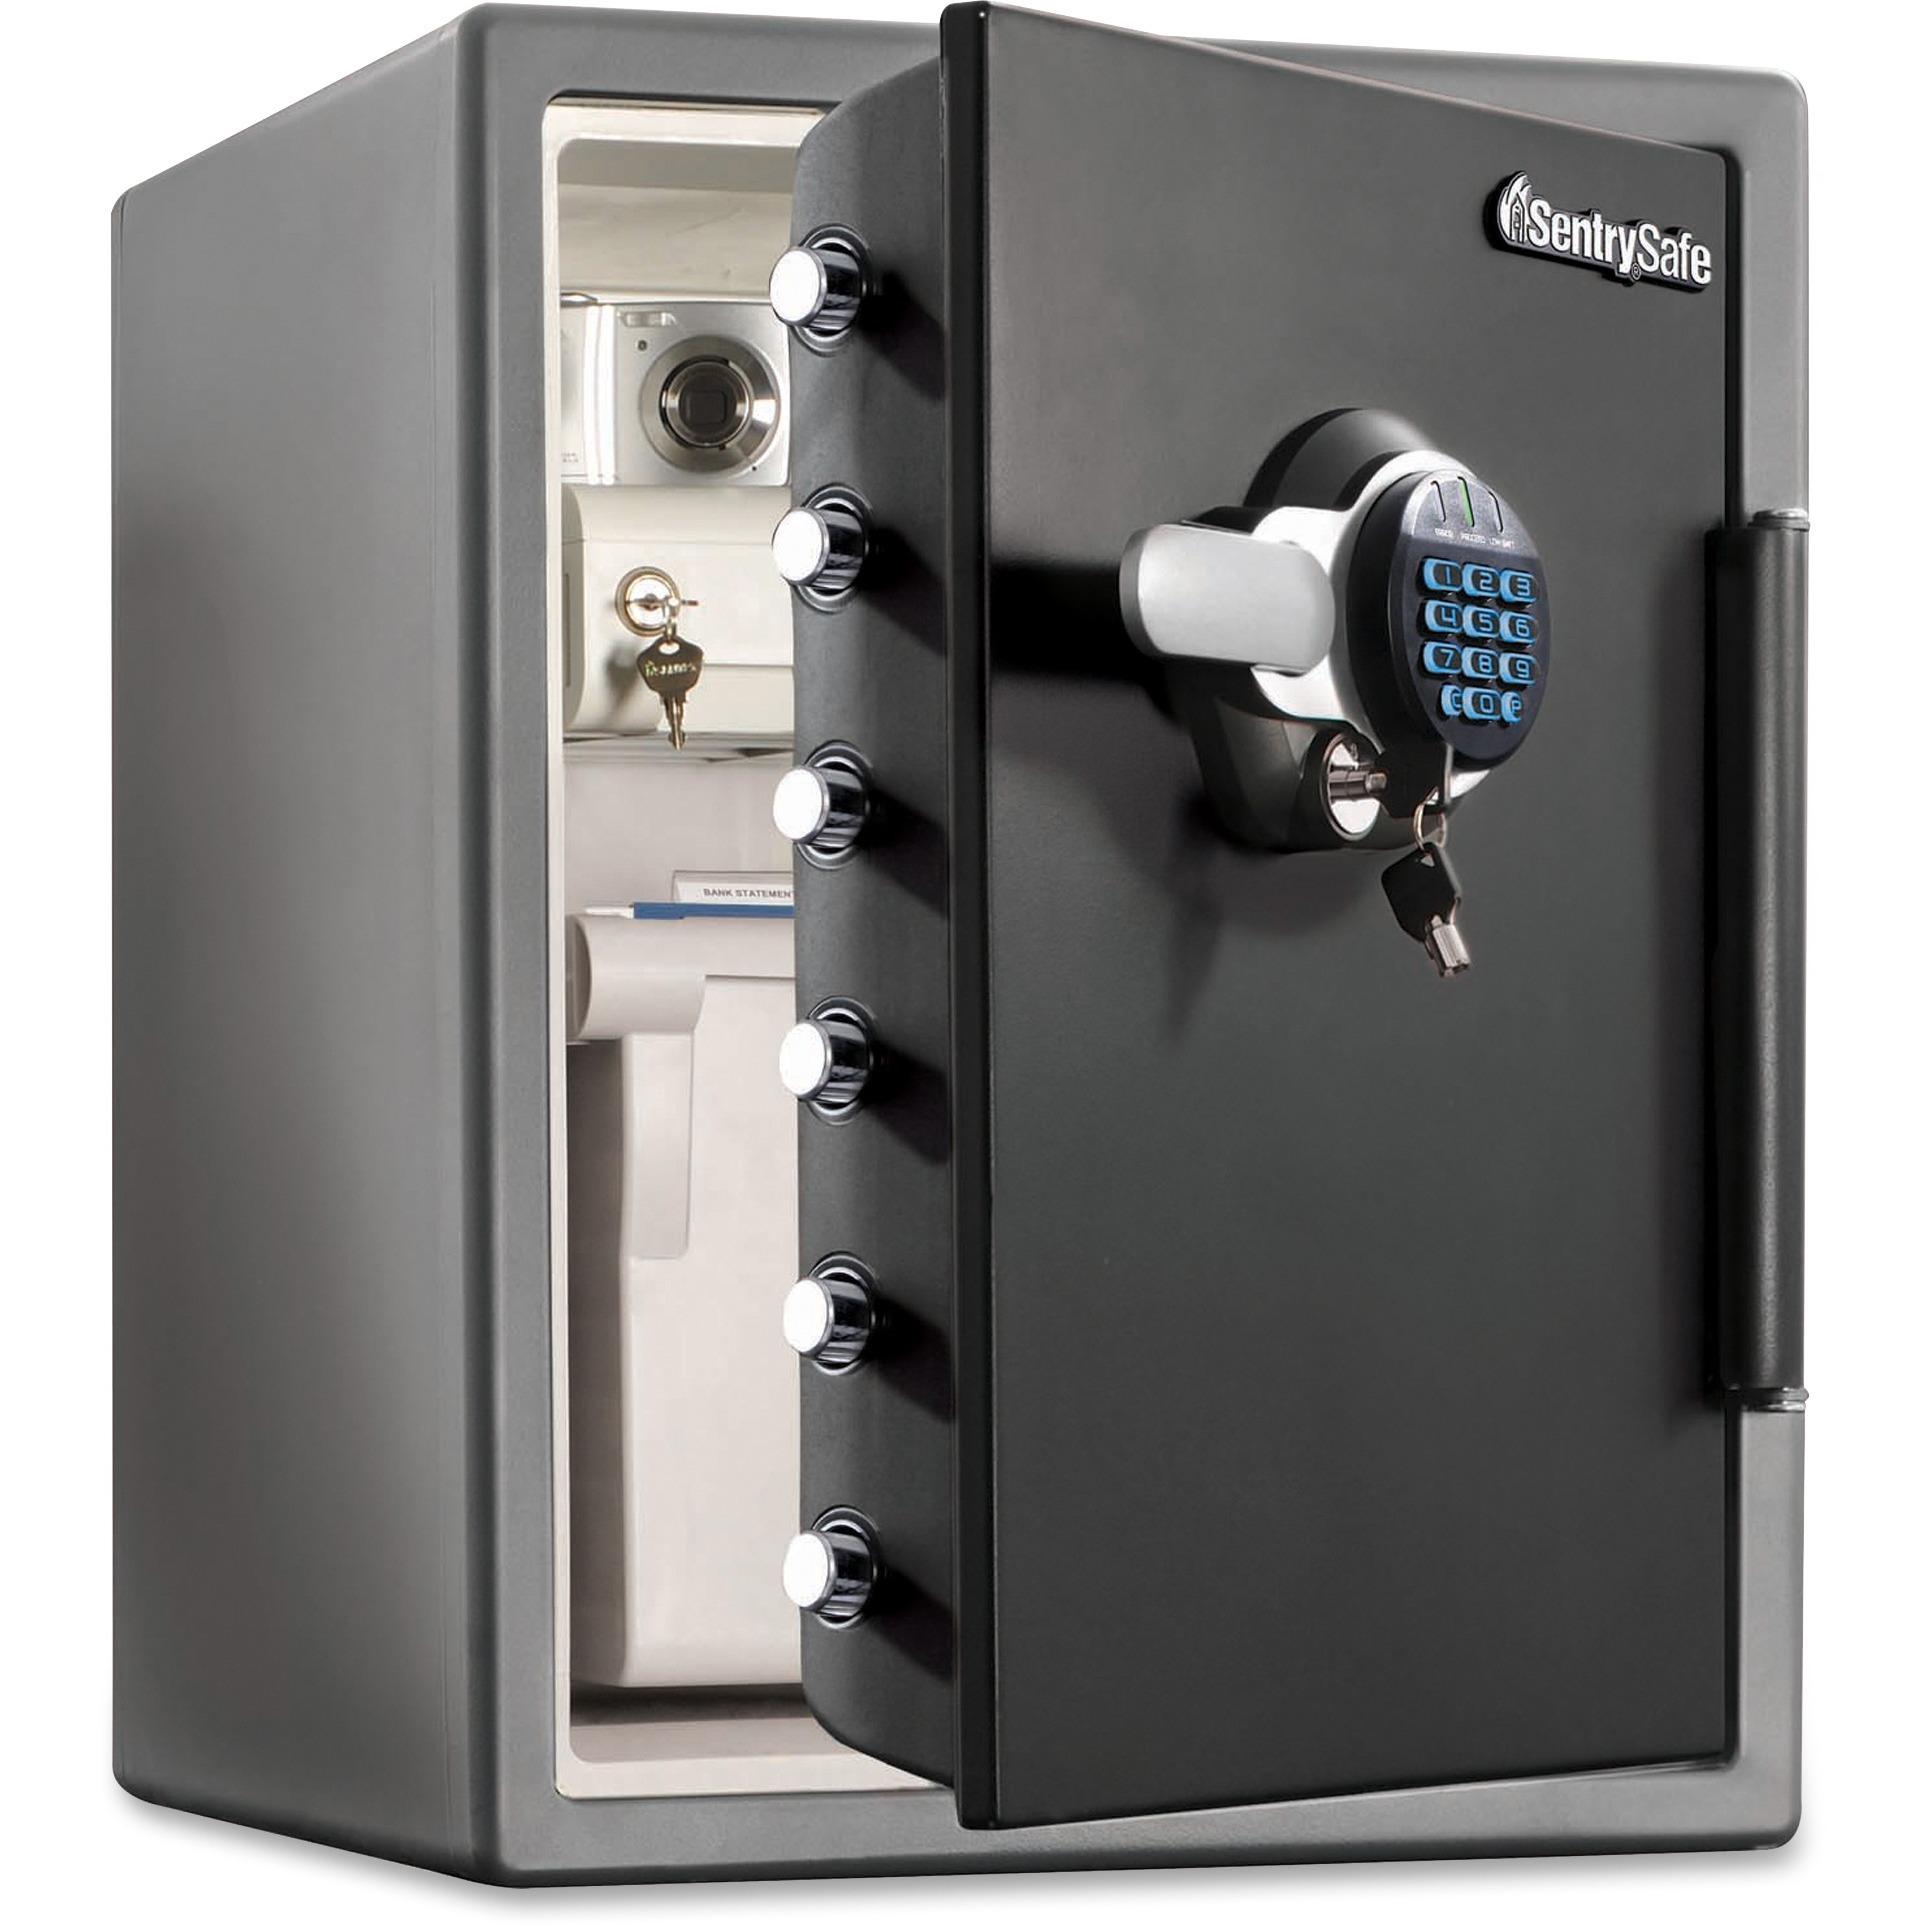 SentrySafe 2 cu. ft. Fire-Resistant Safe, SFW205GRC